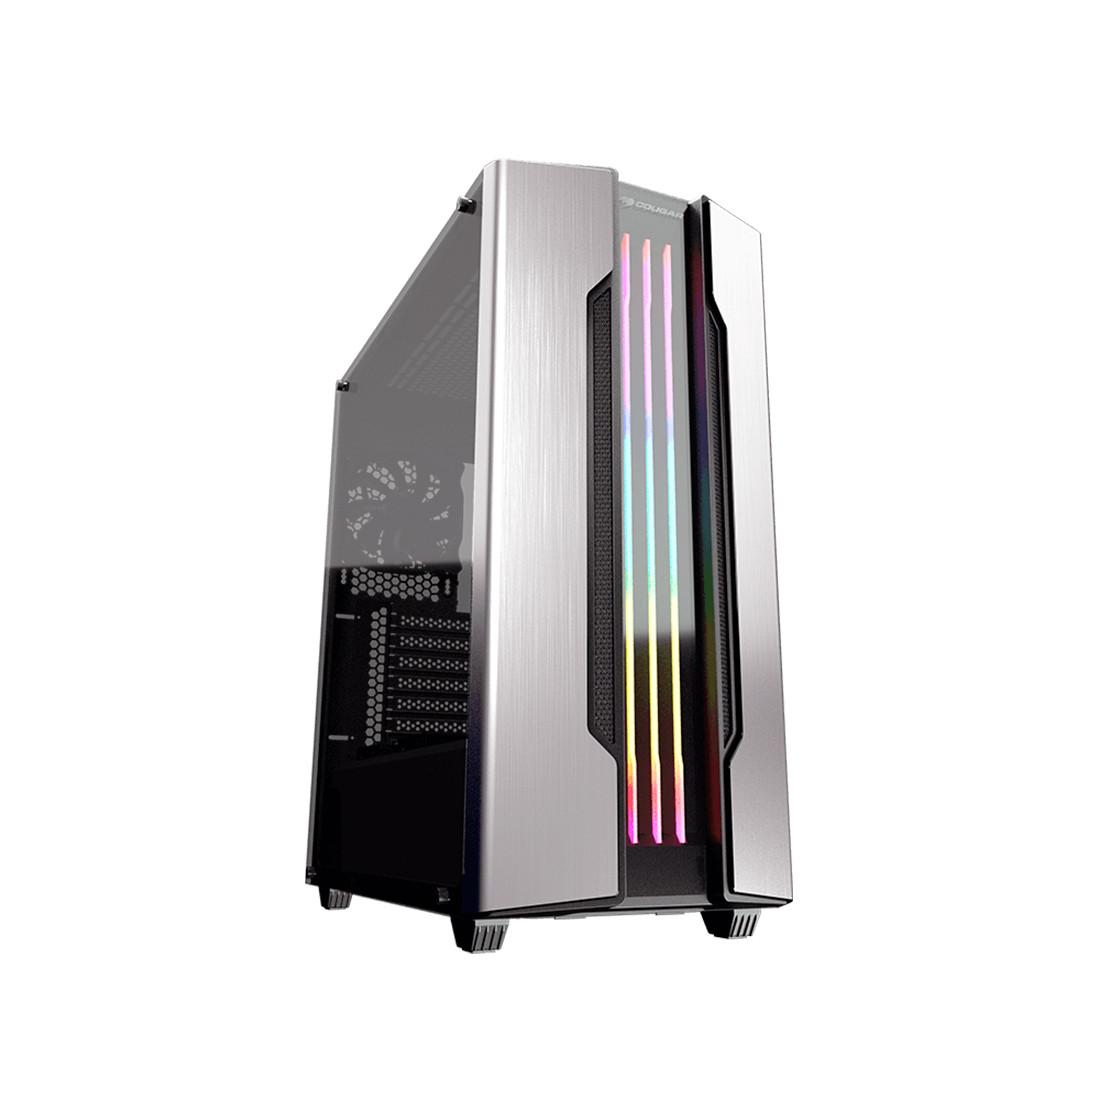 Системный блок Intel Core i5-8400 2.8GHZ/H310/DDR4 4GB/HDD 500GB/VC GT730/450W